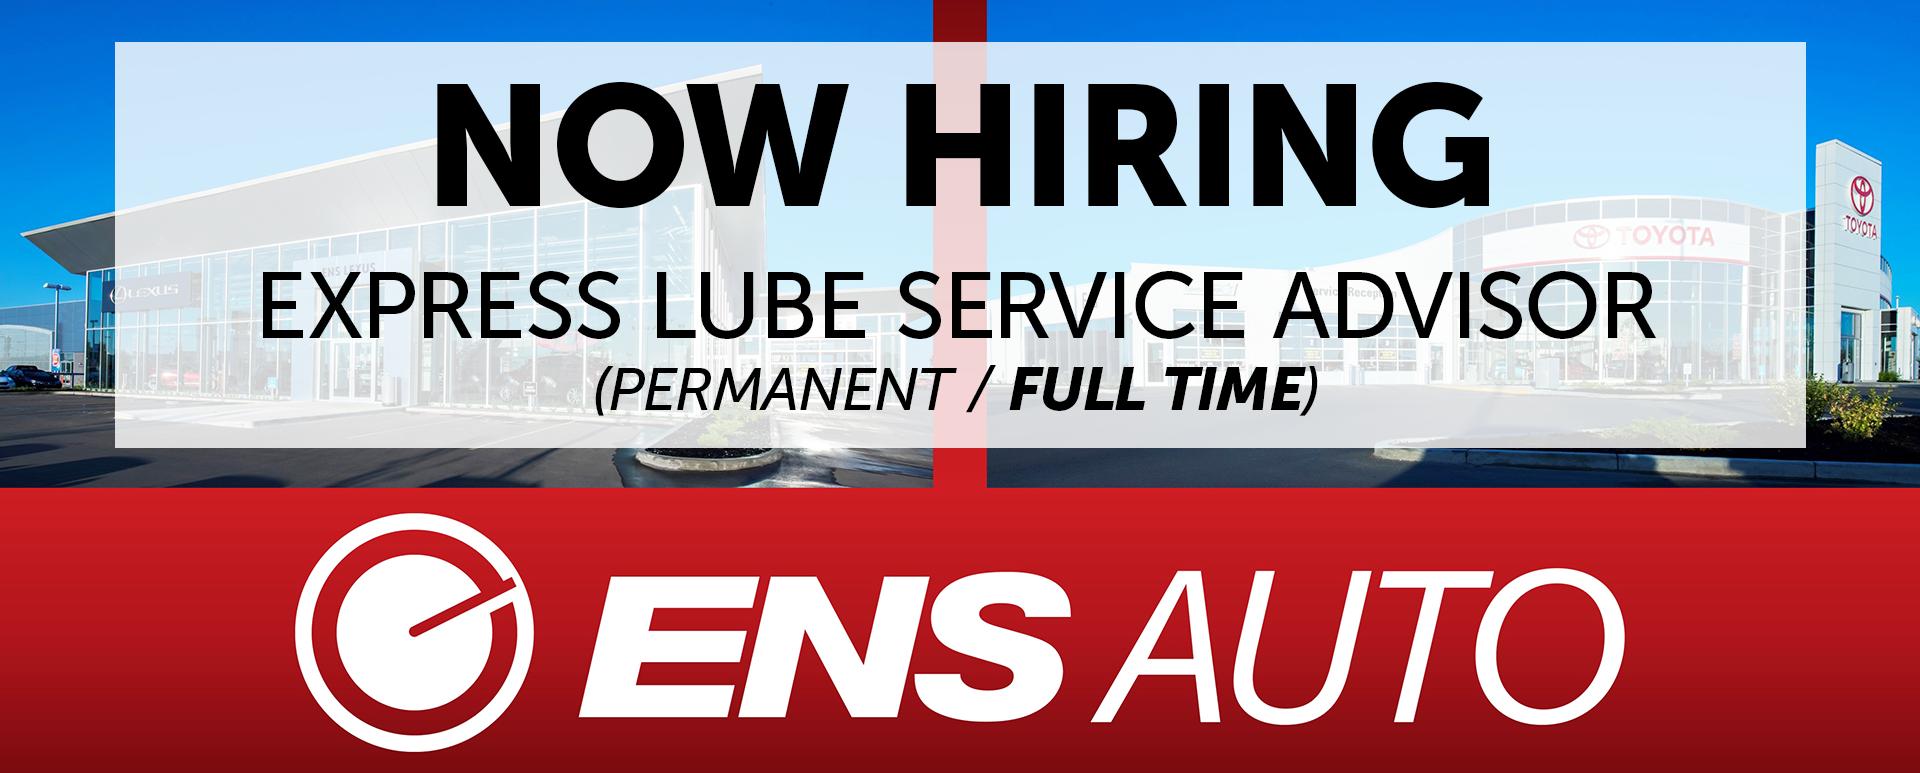 Now Hiring Express Lube Service Advisor